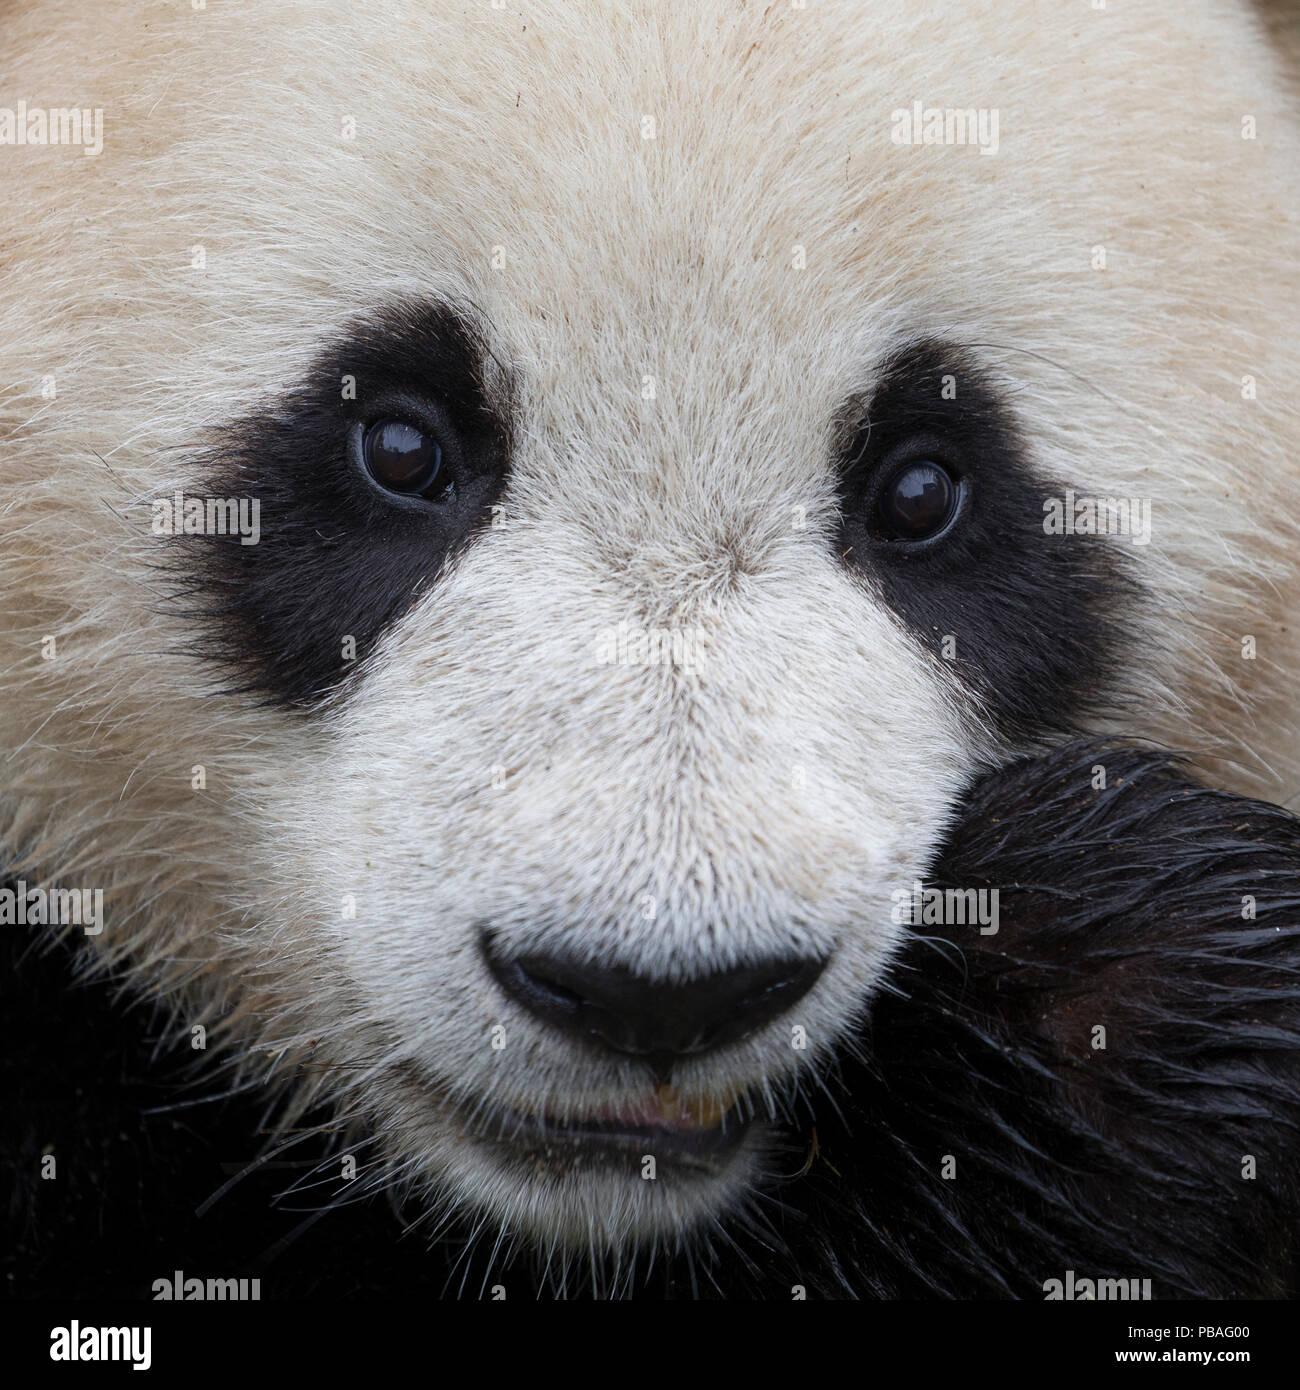 El panda gigante (Ailuropoda melanoleuca) cara cerrar cautivo, China Imagen De Stock